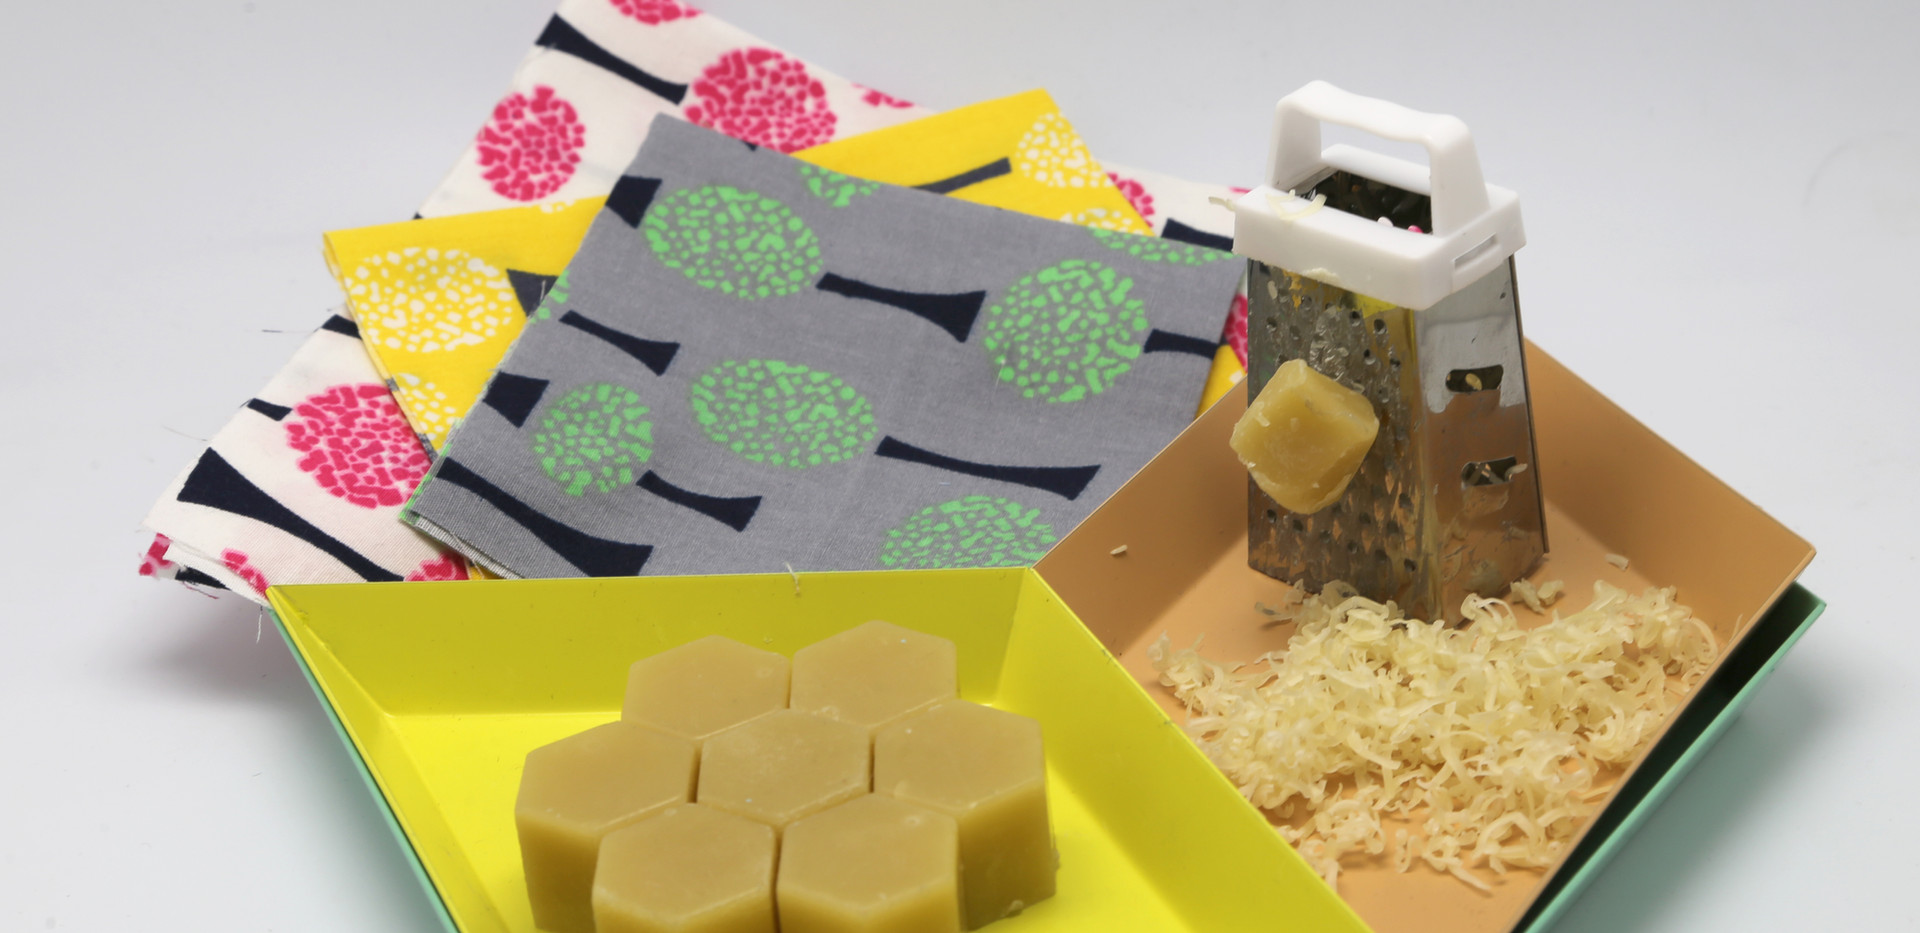 Beeswax Cloth DIY Kit